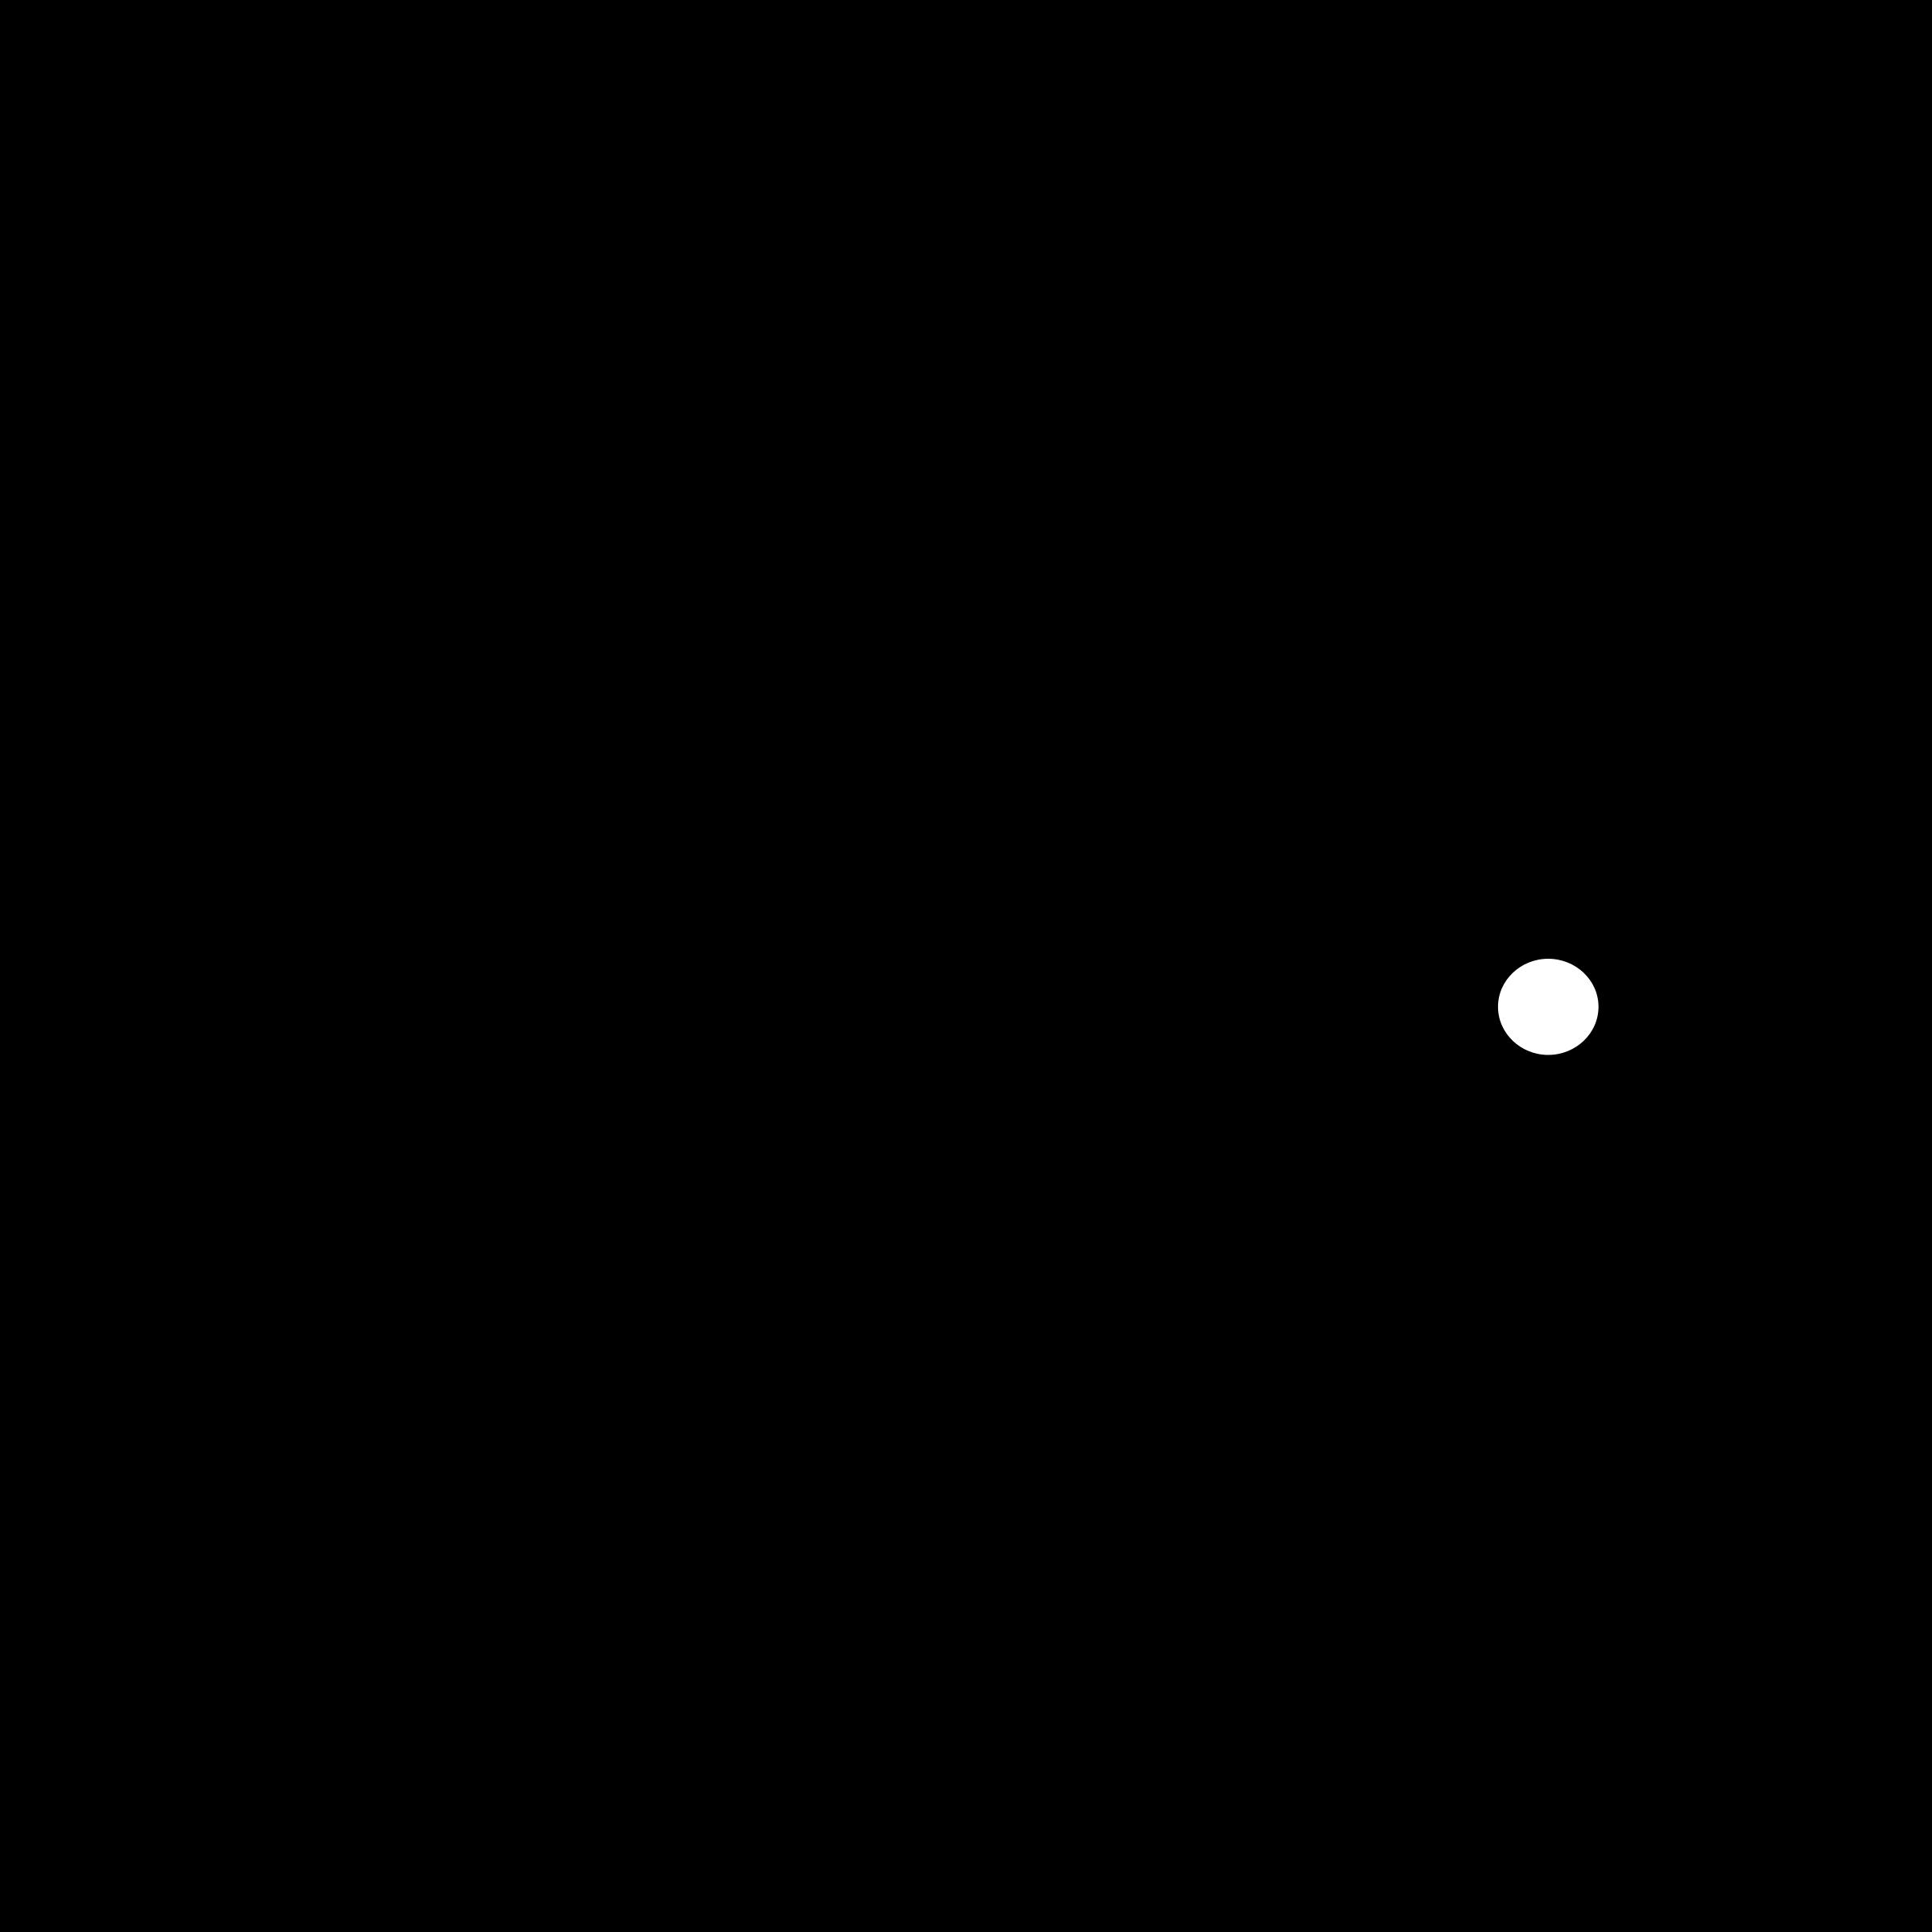 mannington-1-logo-png-transparent.png